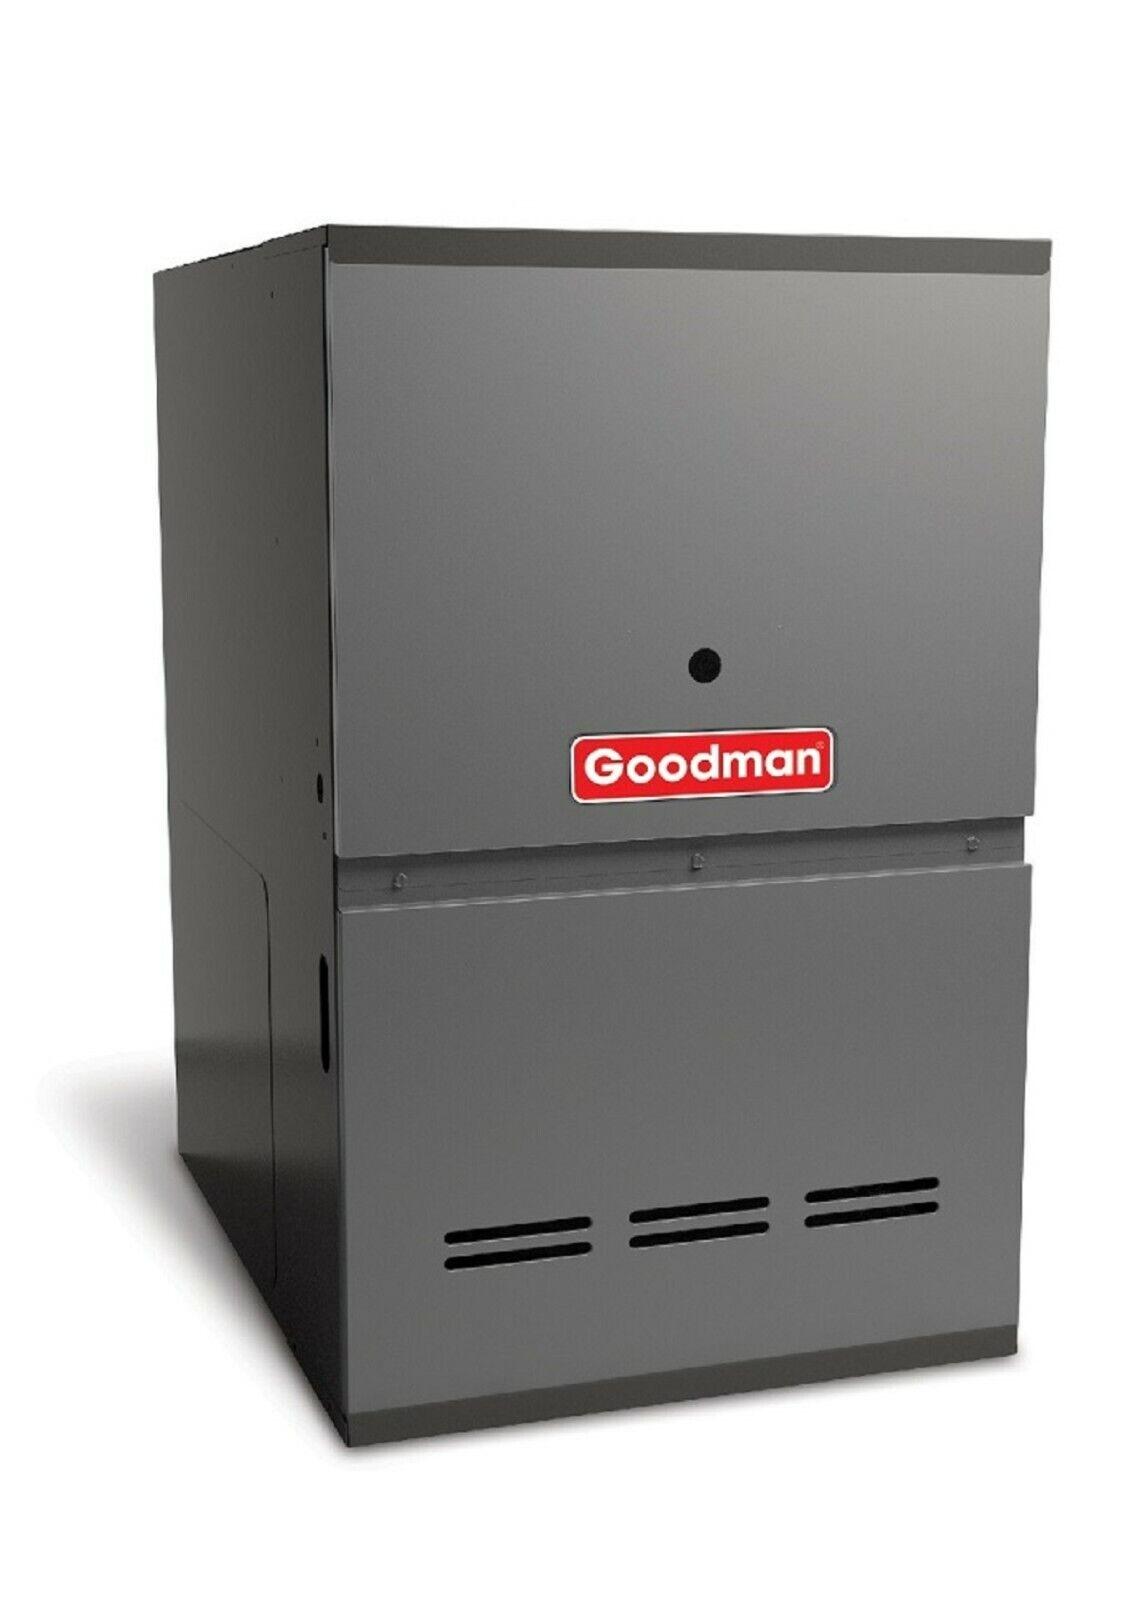 Goodman 100,000 BTU 80% AFUE Downflow Gas Furnace Model GDS8